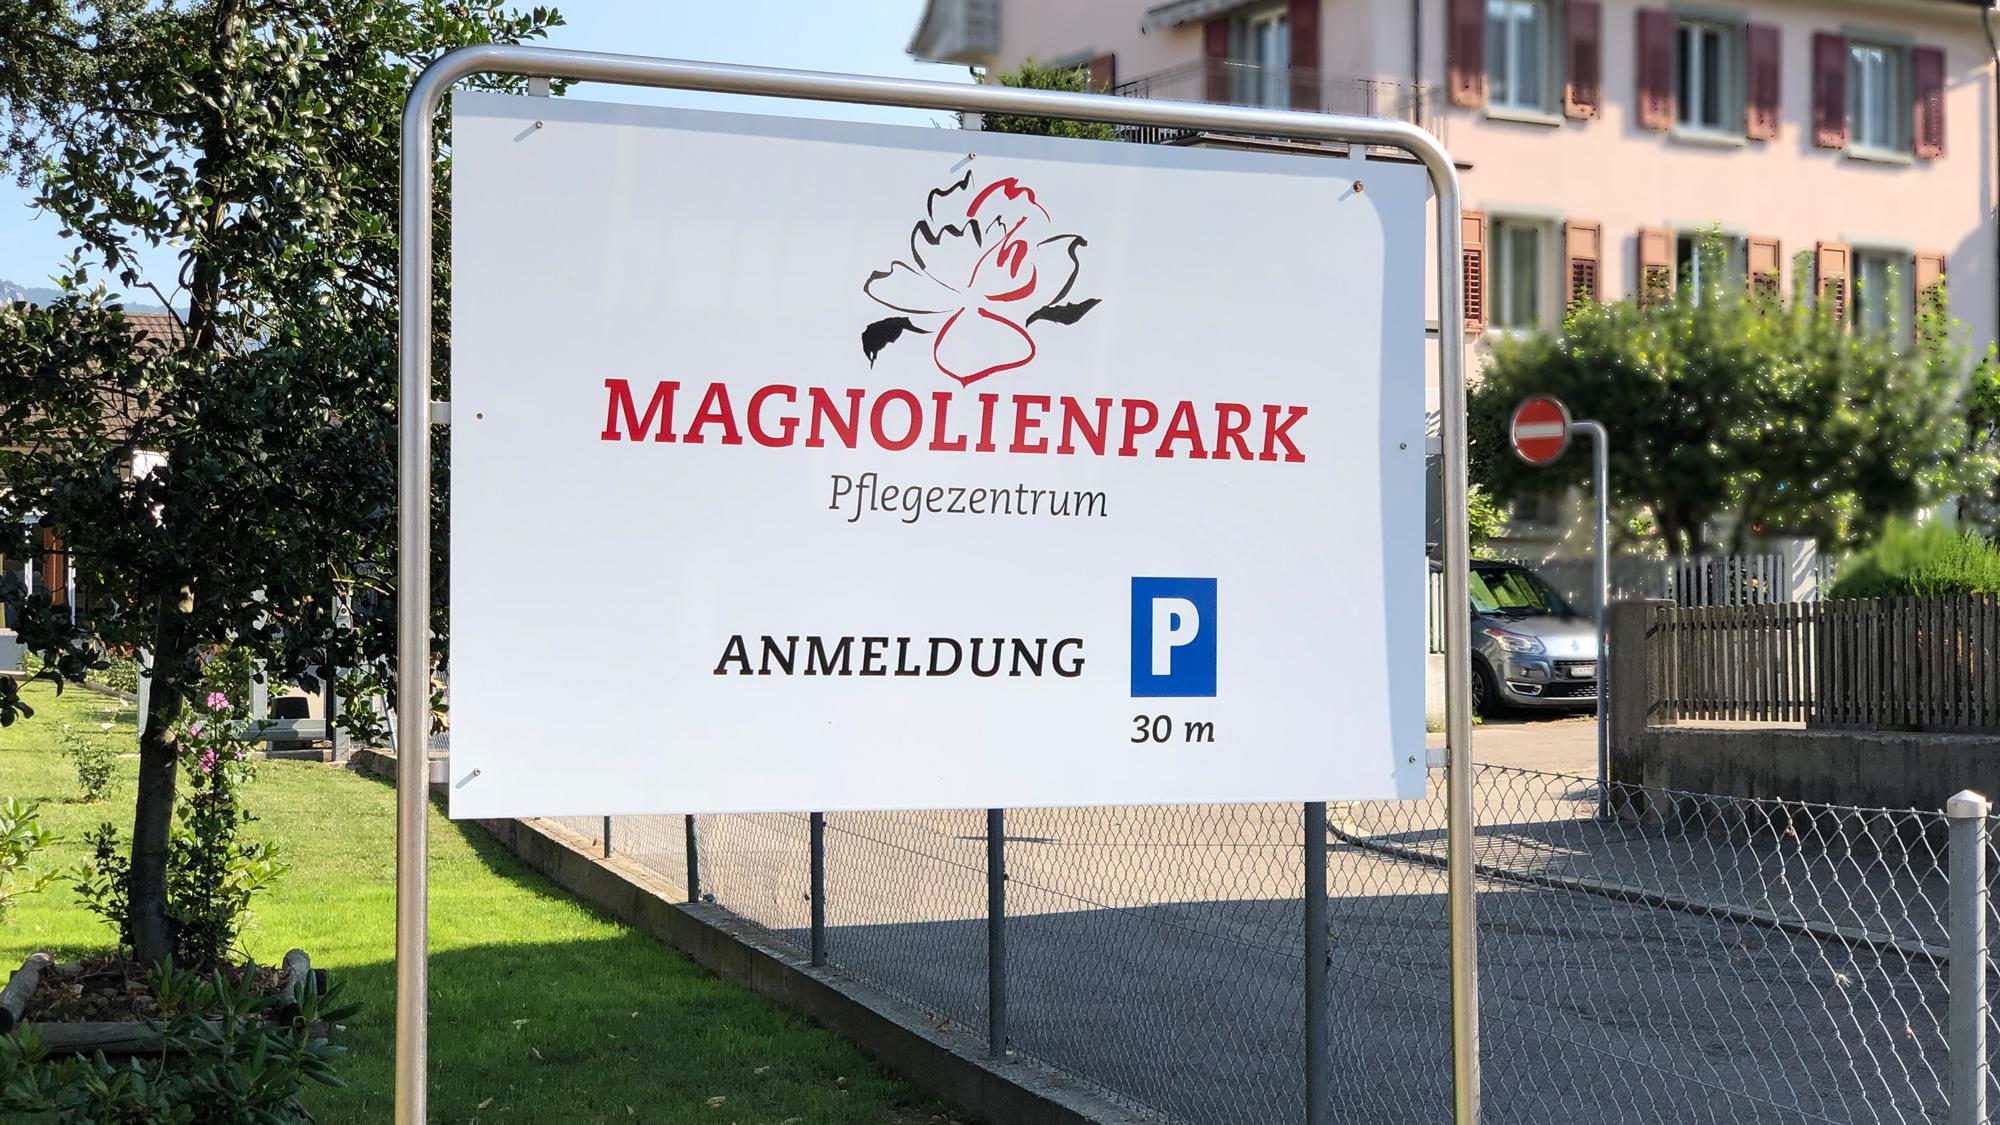 Magnolienpark.jpg